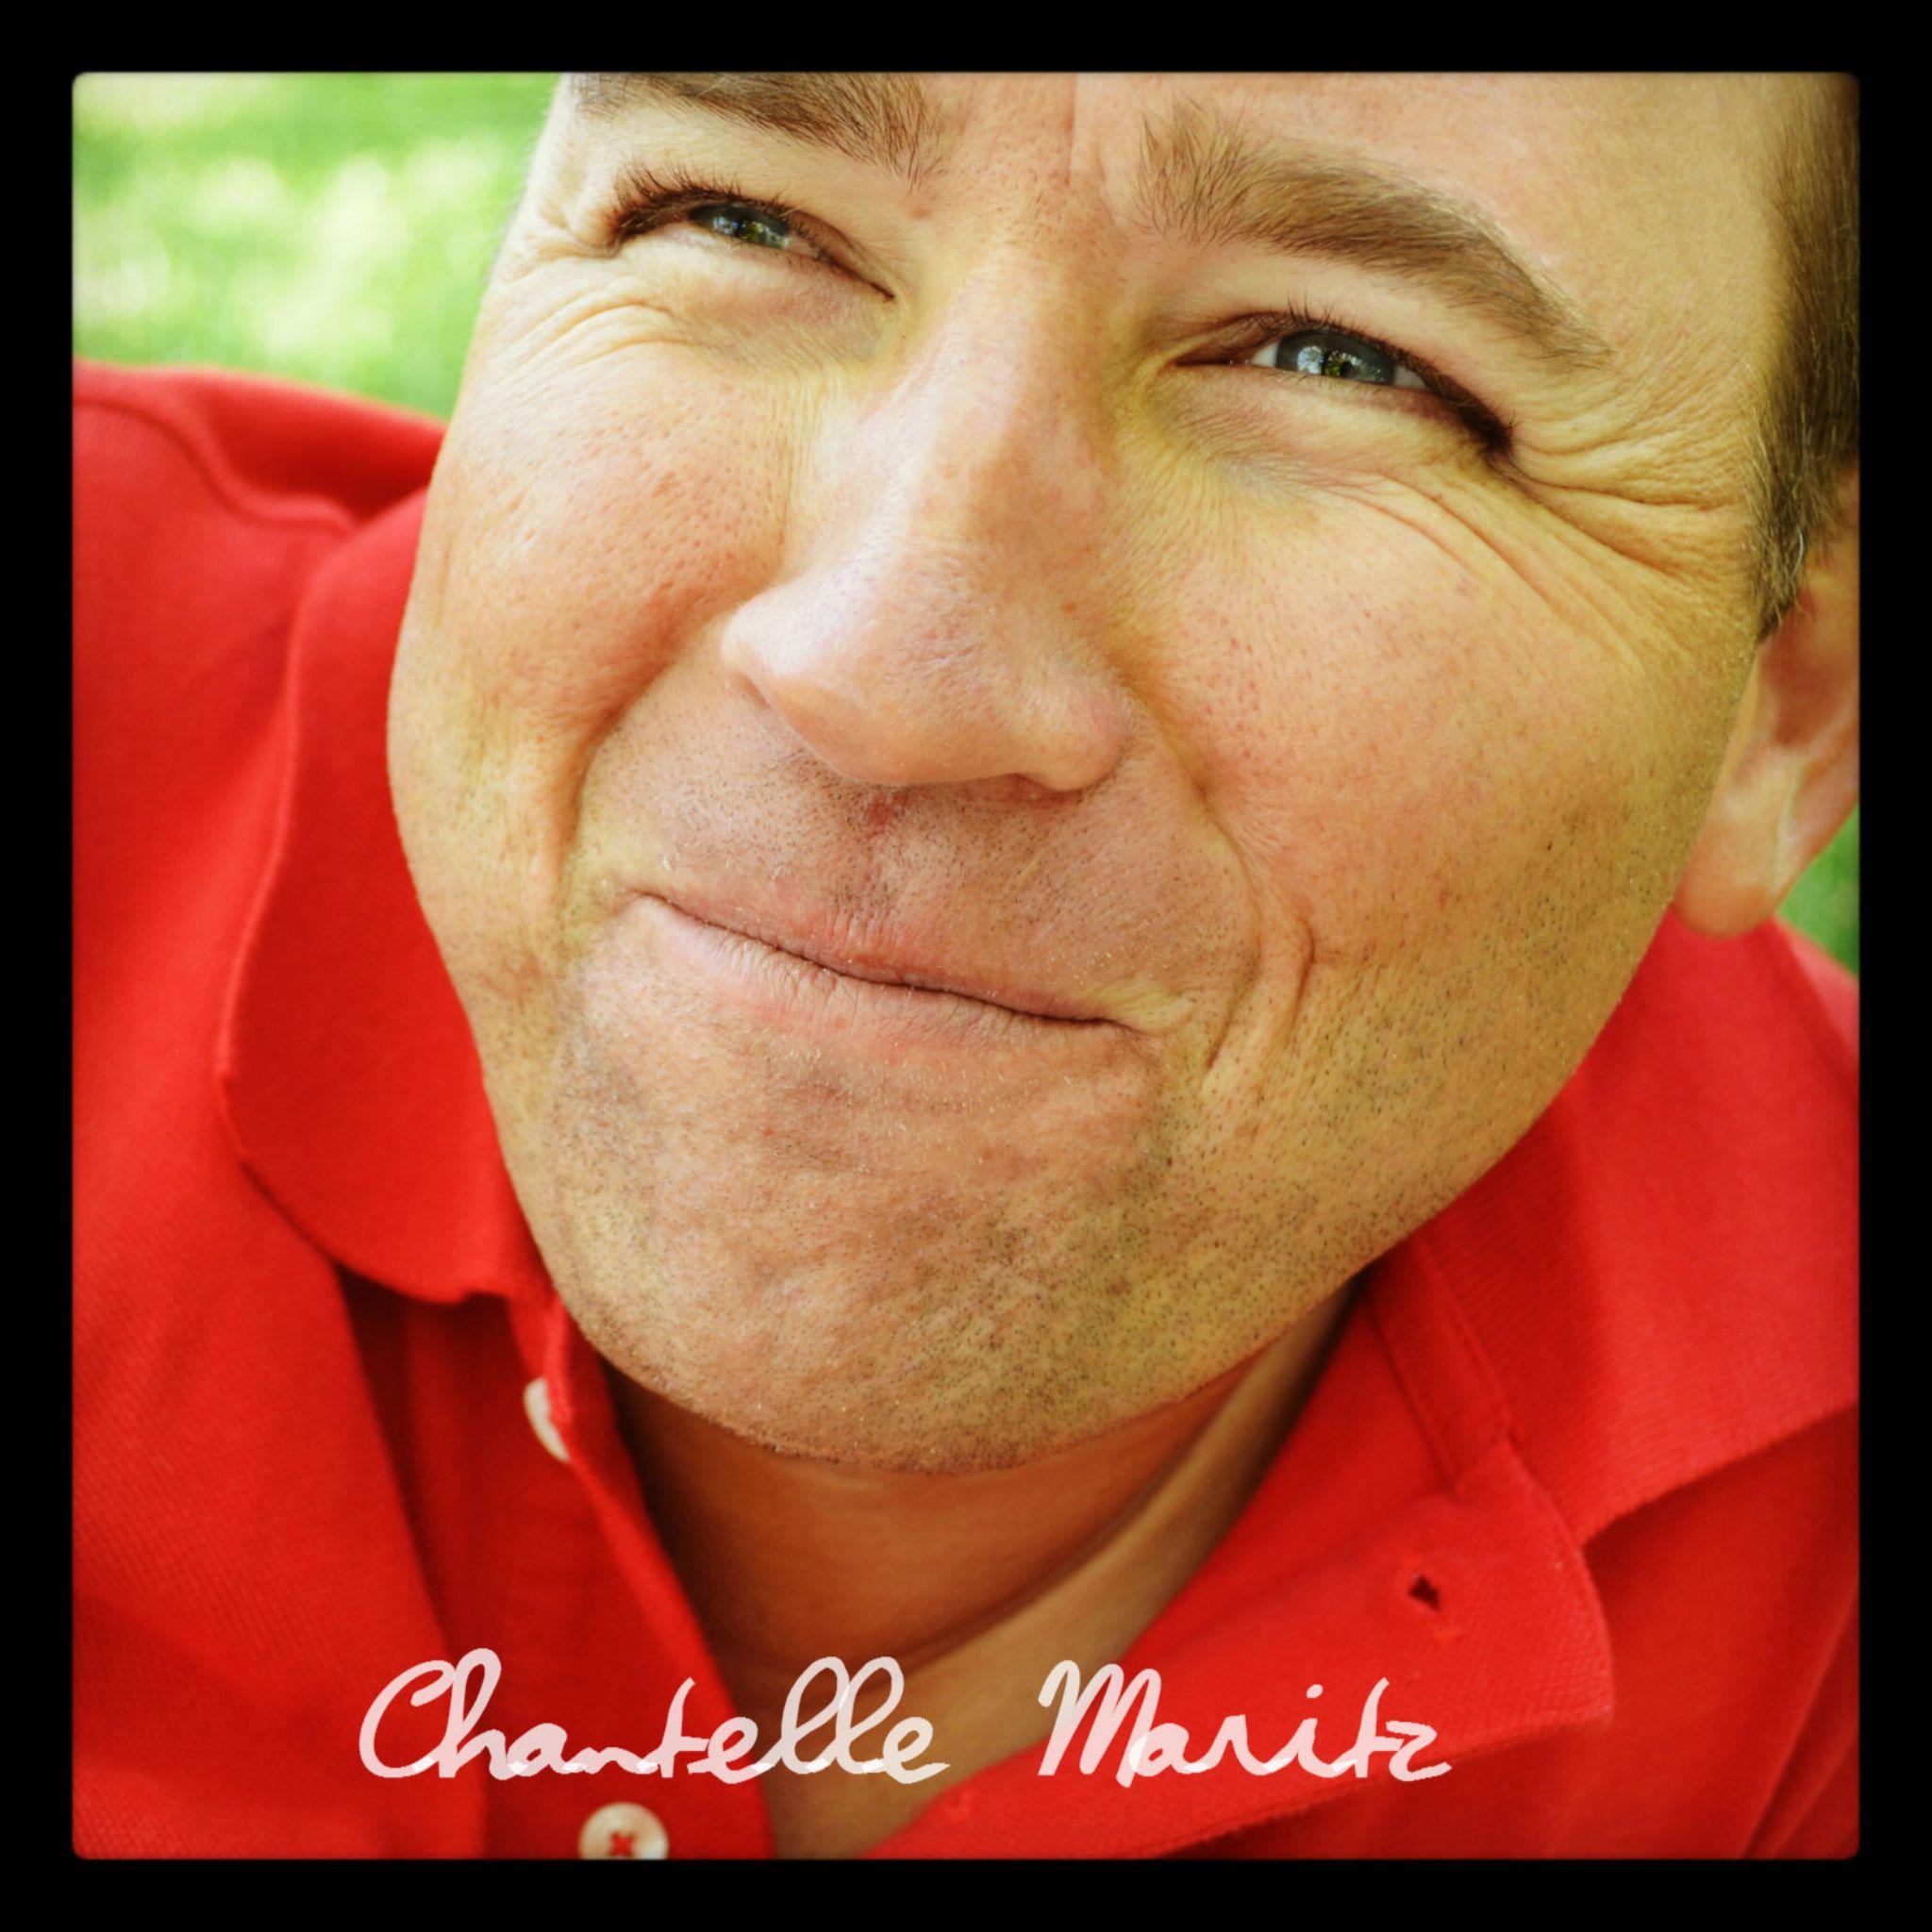 Mr Handsome by Chantelle Maritz